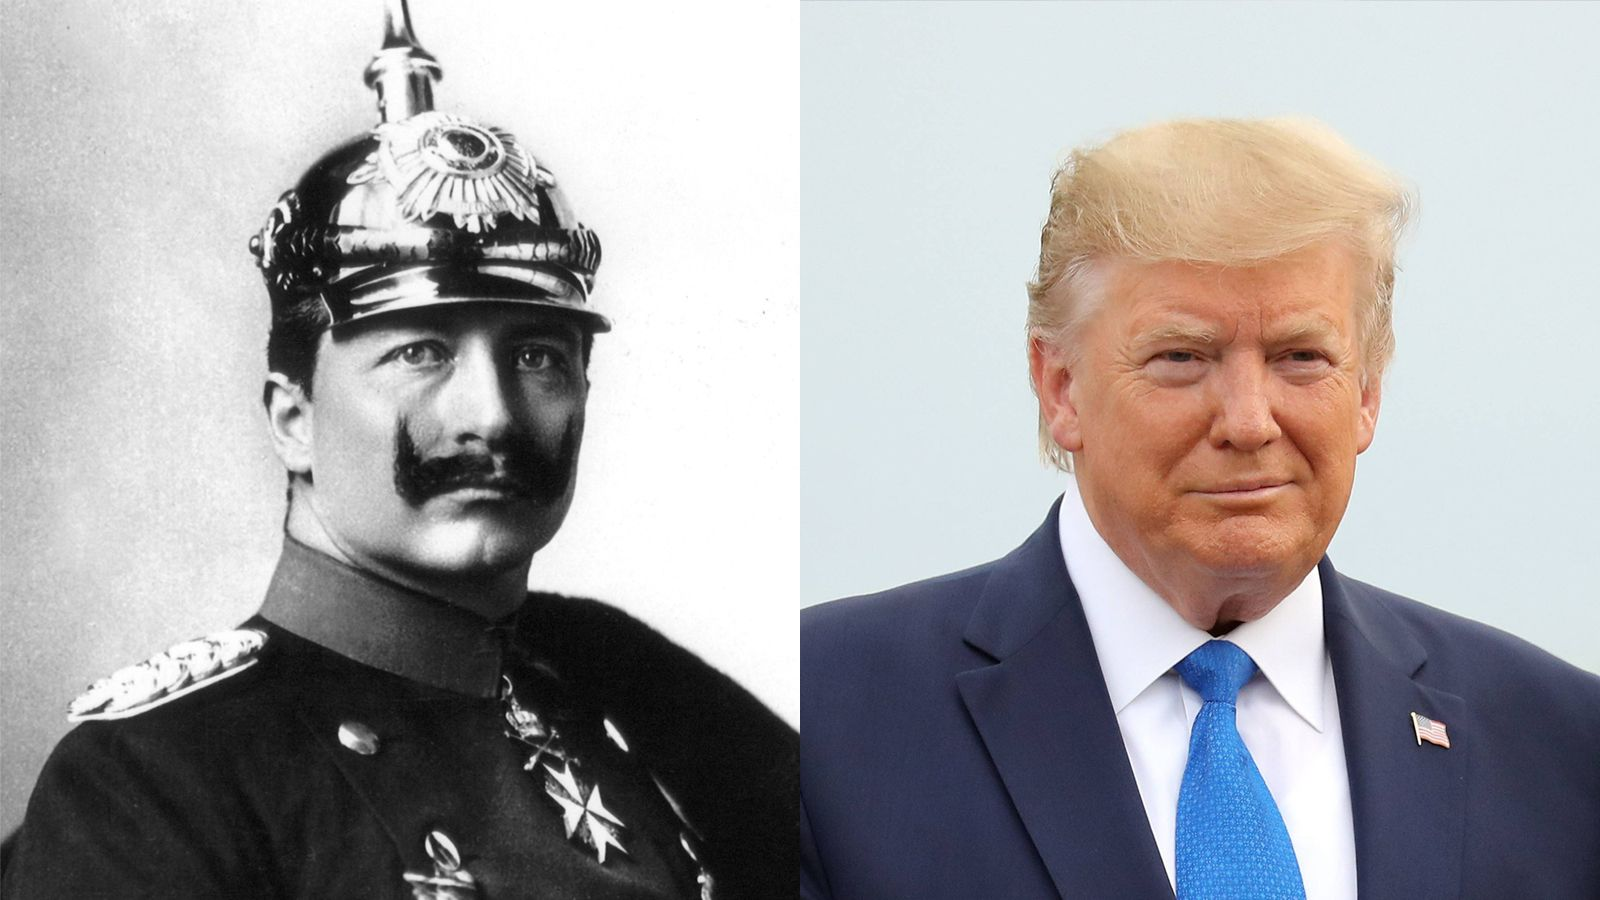 Kaiser Trump